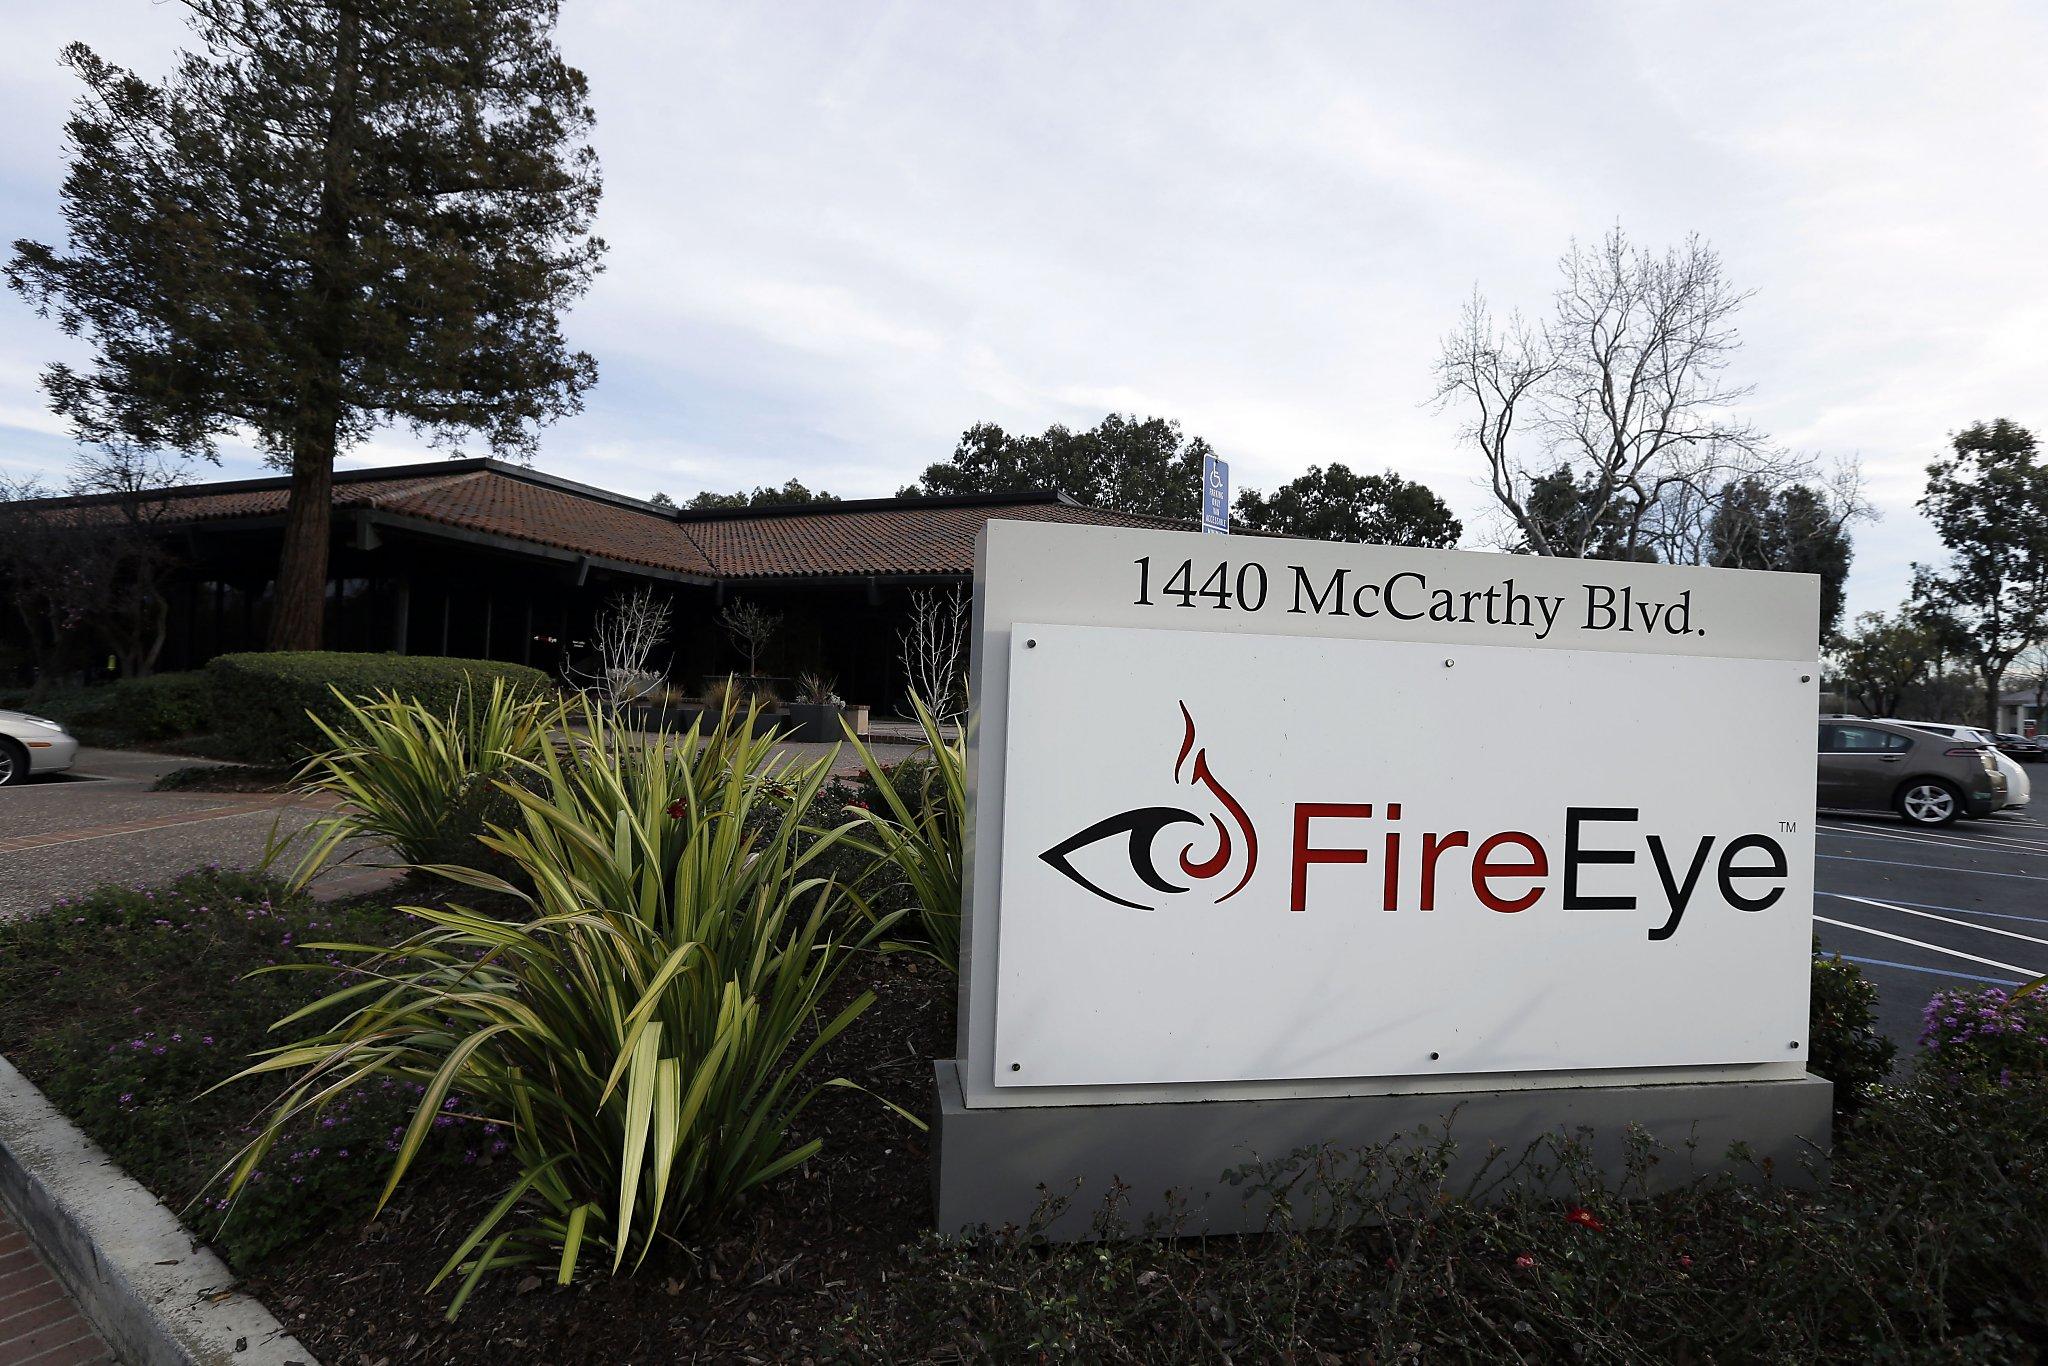 FireEye fight exposes rift between researchers, firms